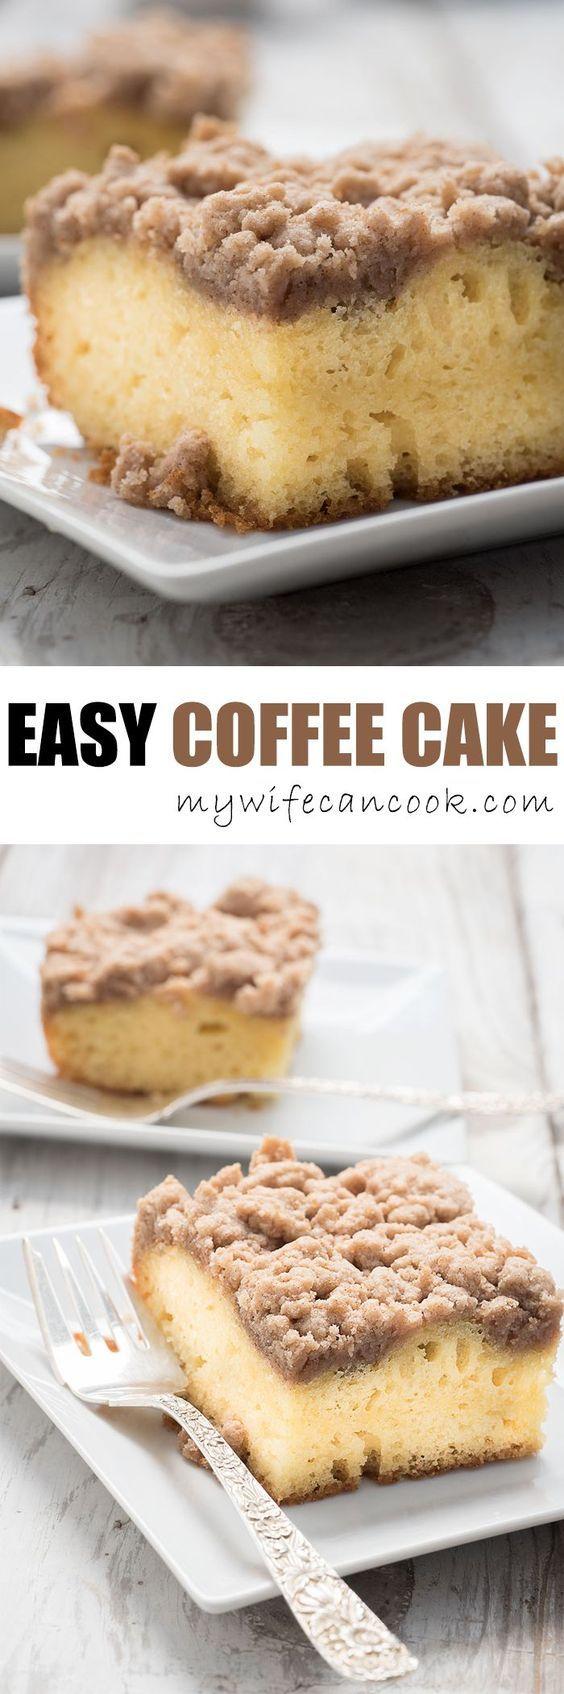 Easy Coffee Cake Recipe Recipes Cakes Cupcakes Pinterest